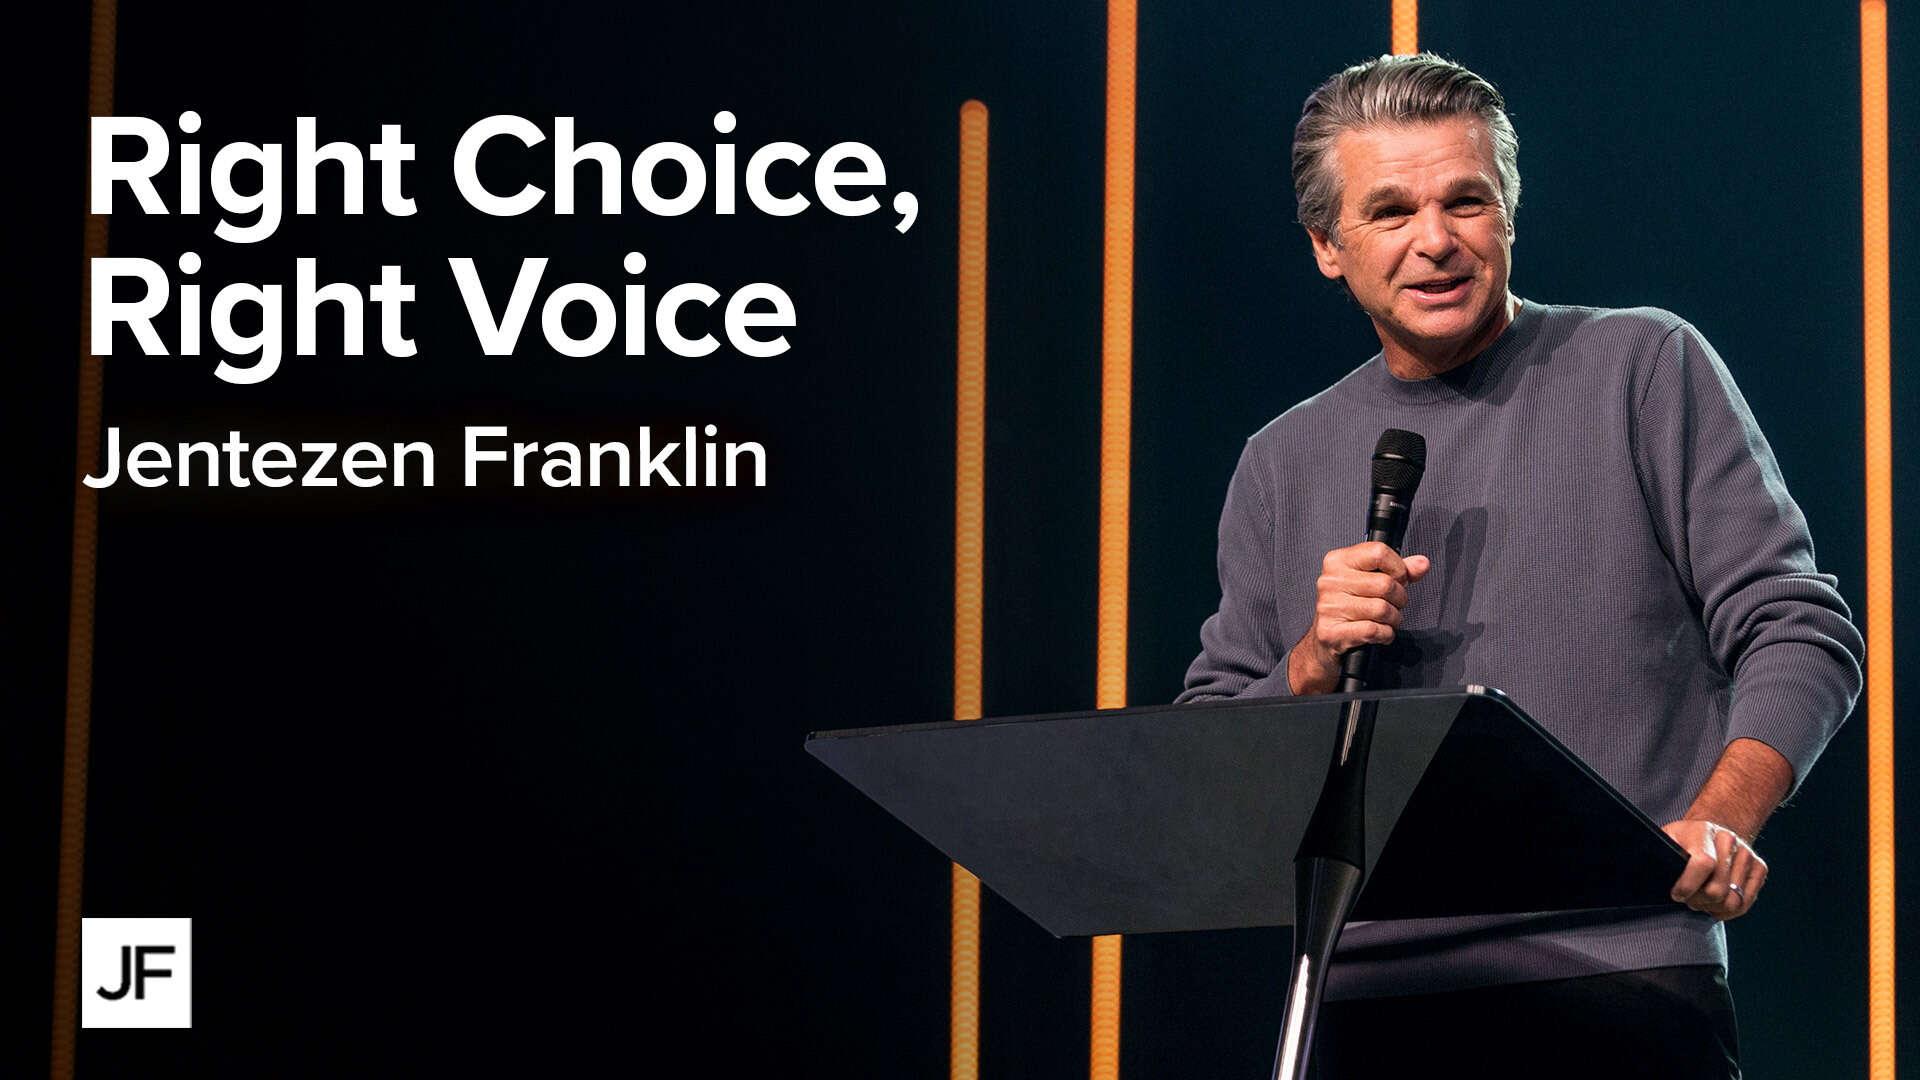 Right Voice, Right Choice Jentezen Franklin